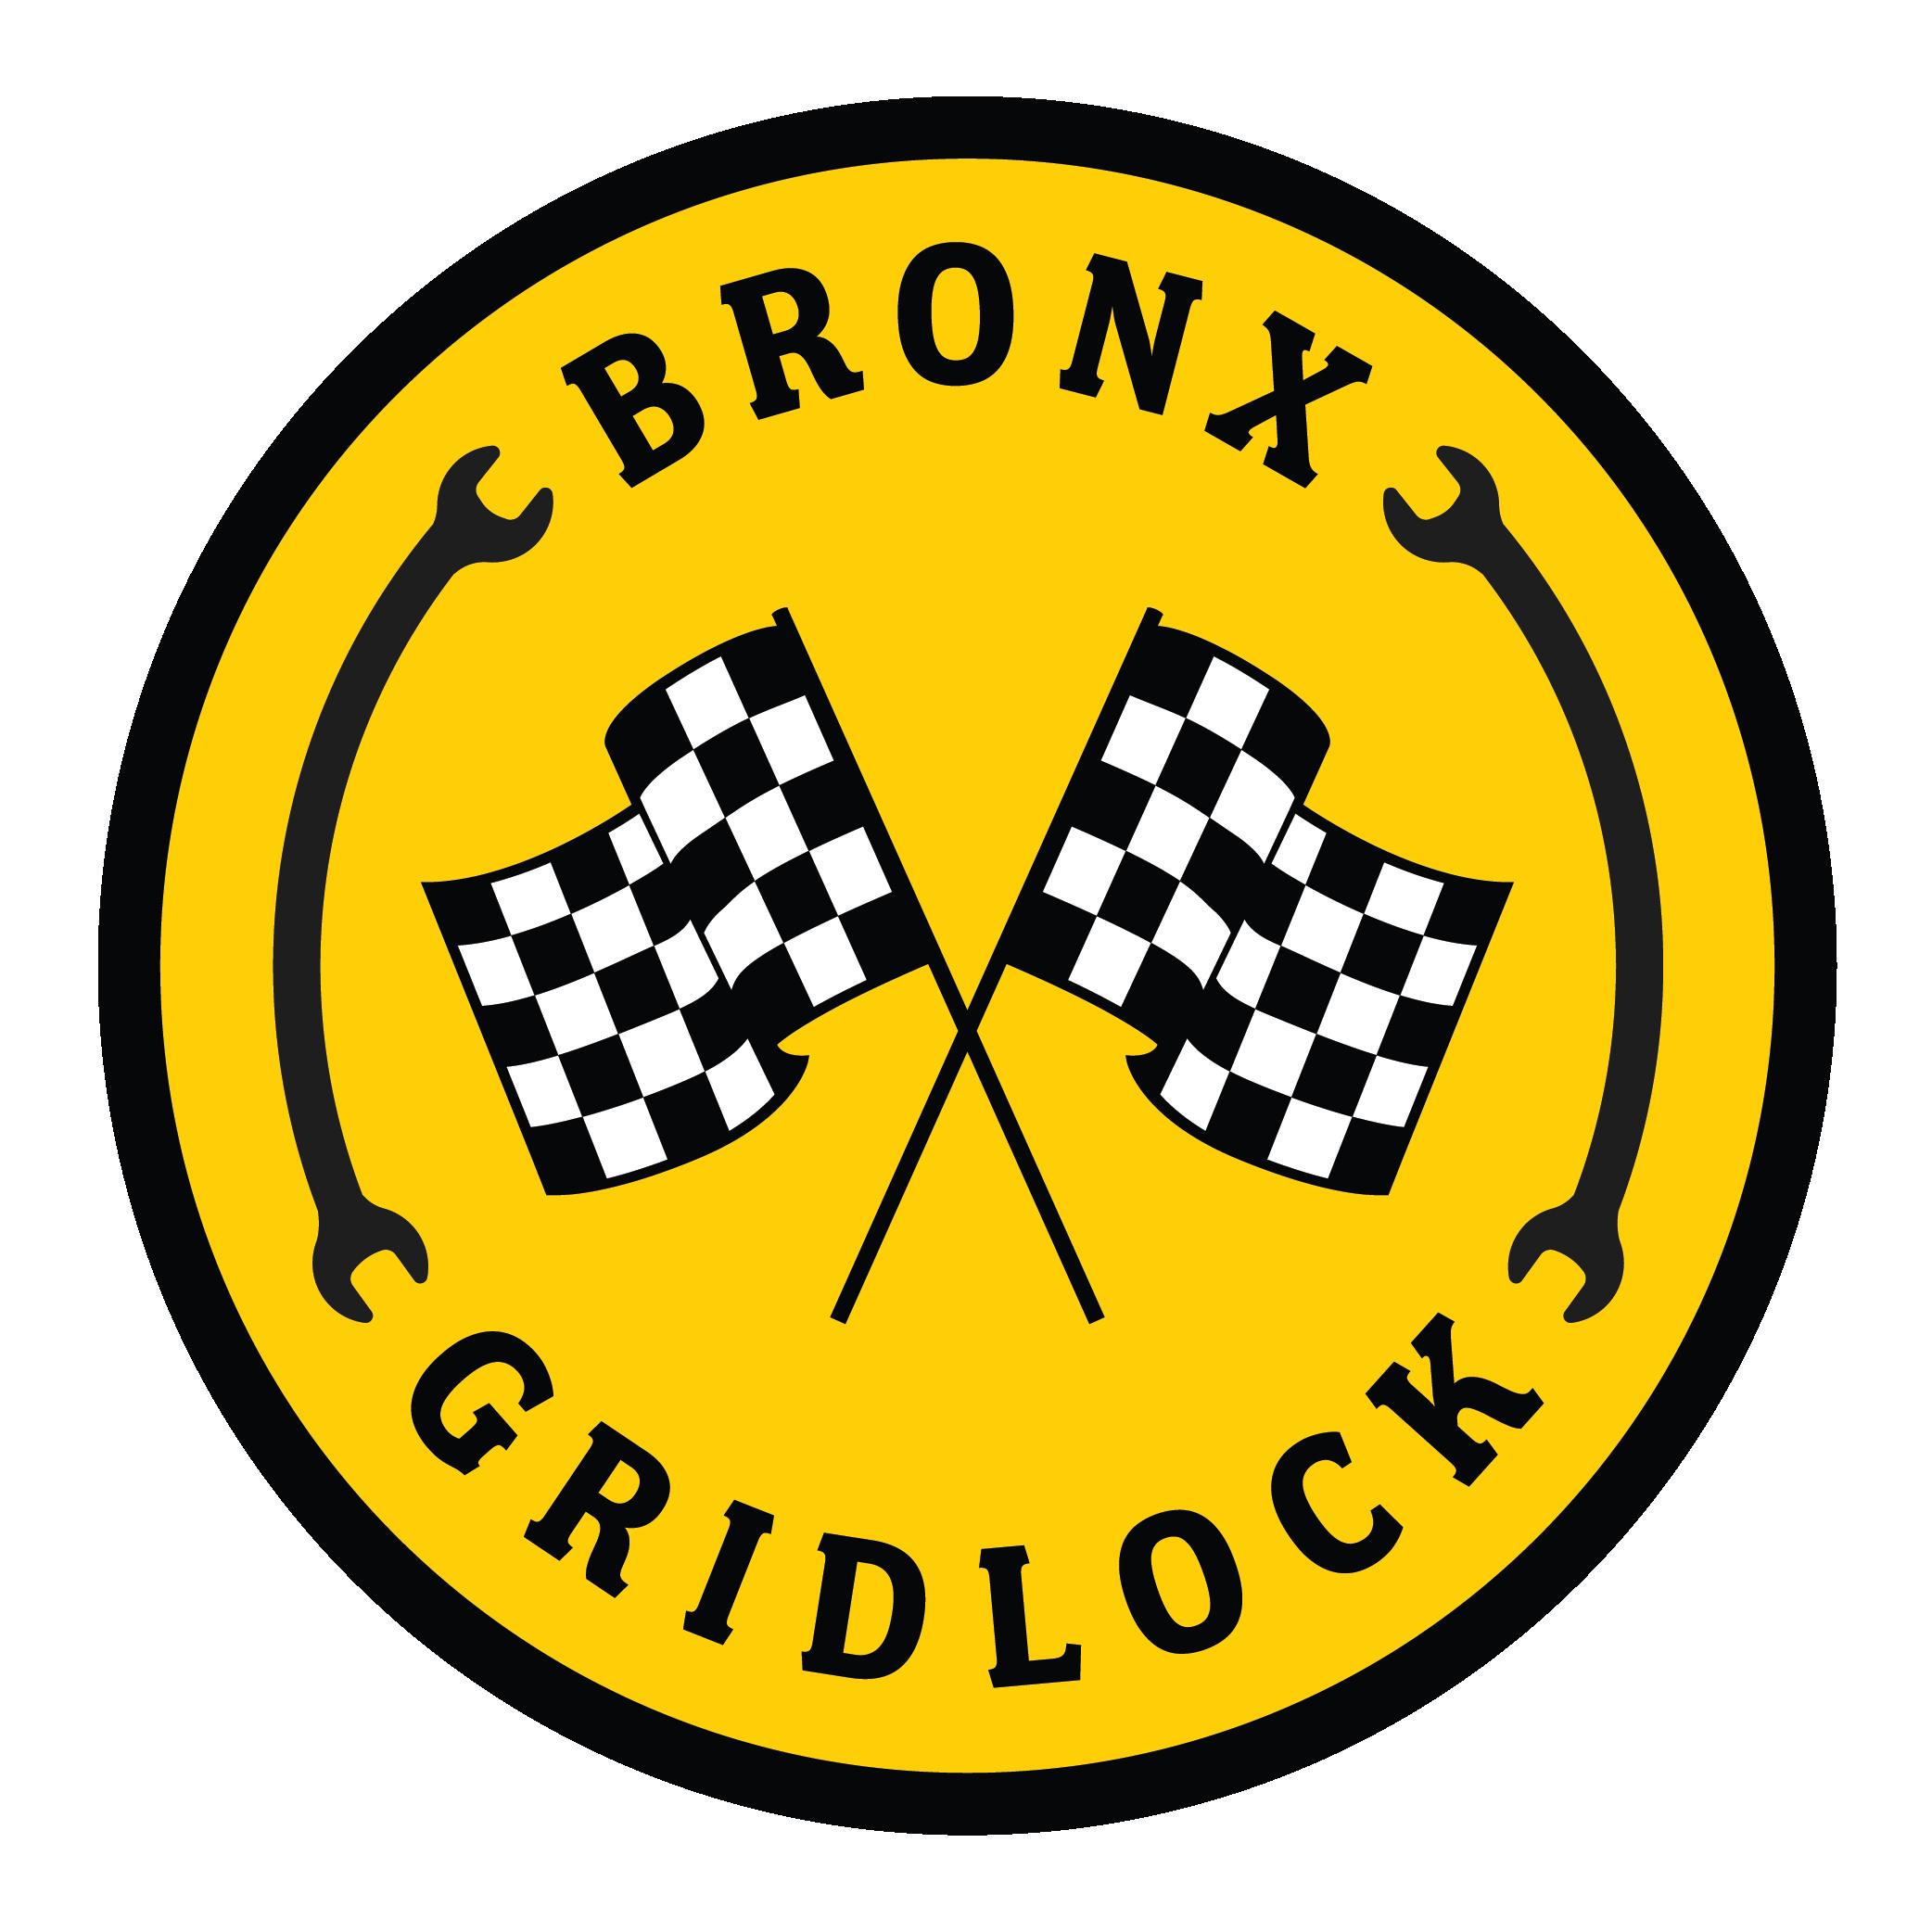 GGRD LOGO_Bronx Gridlock.png